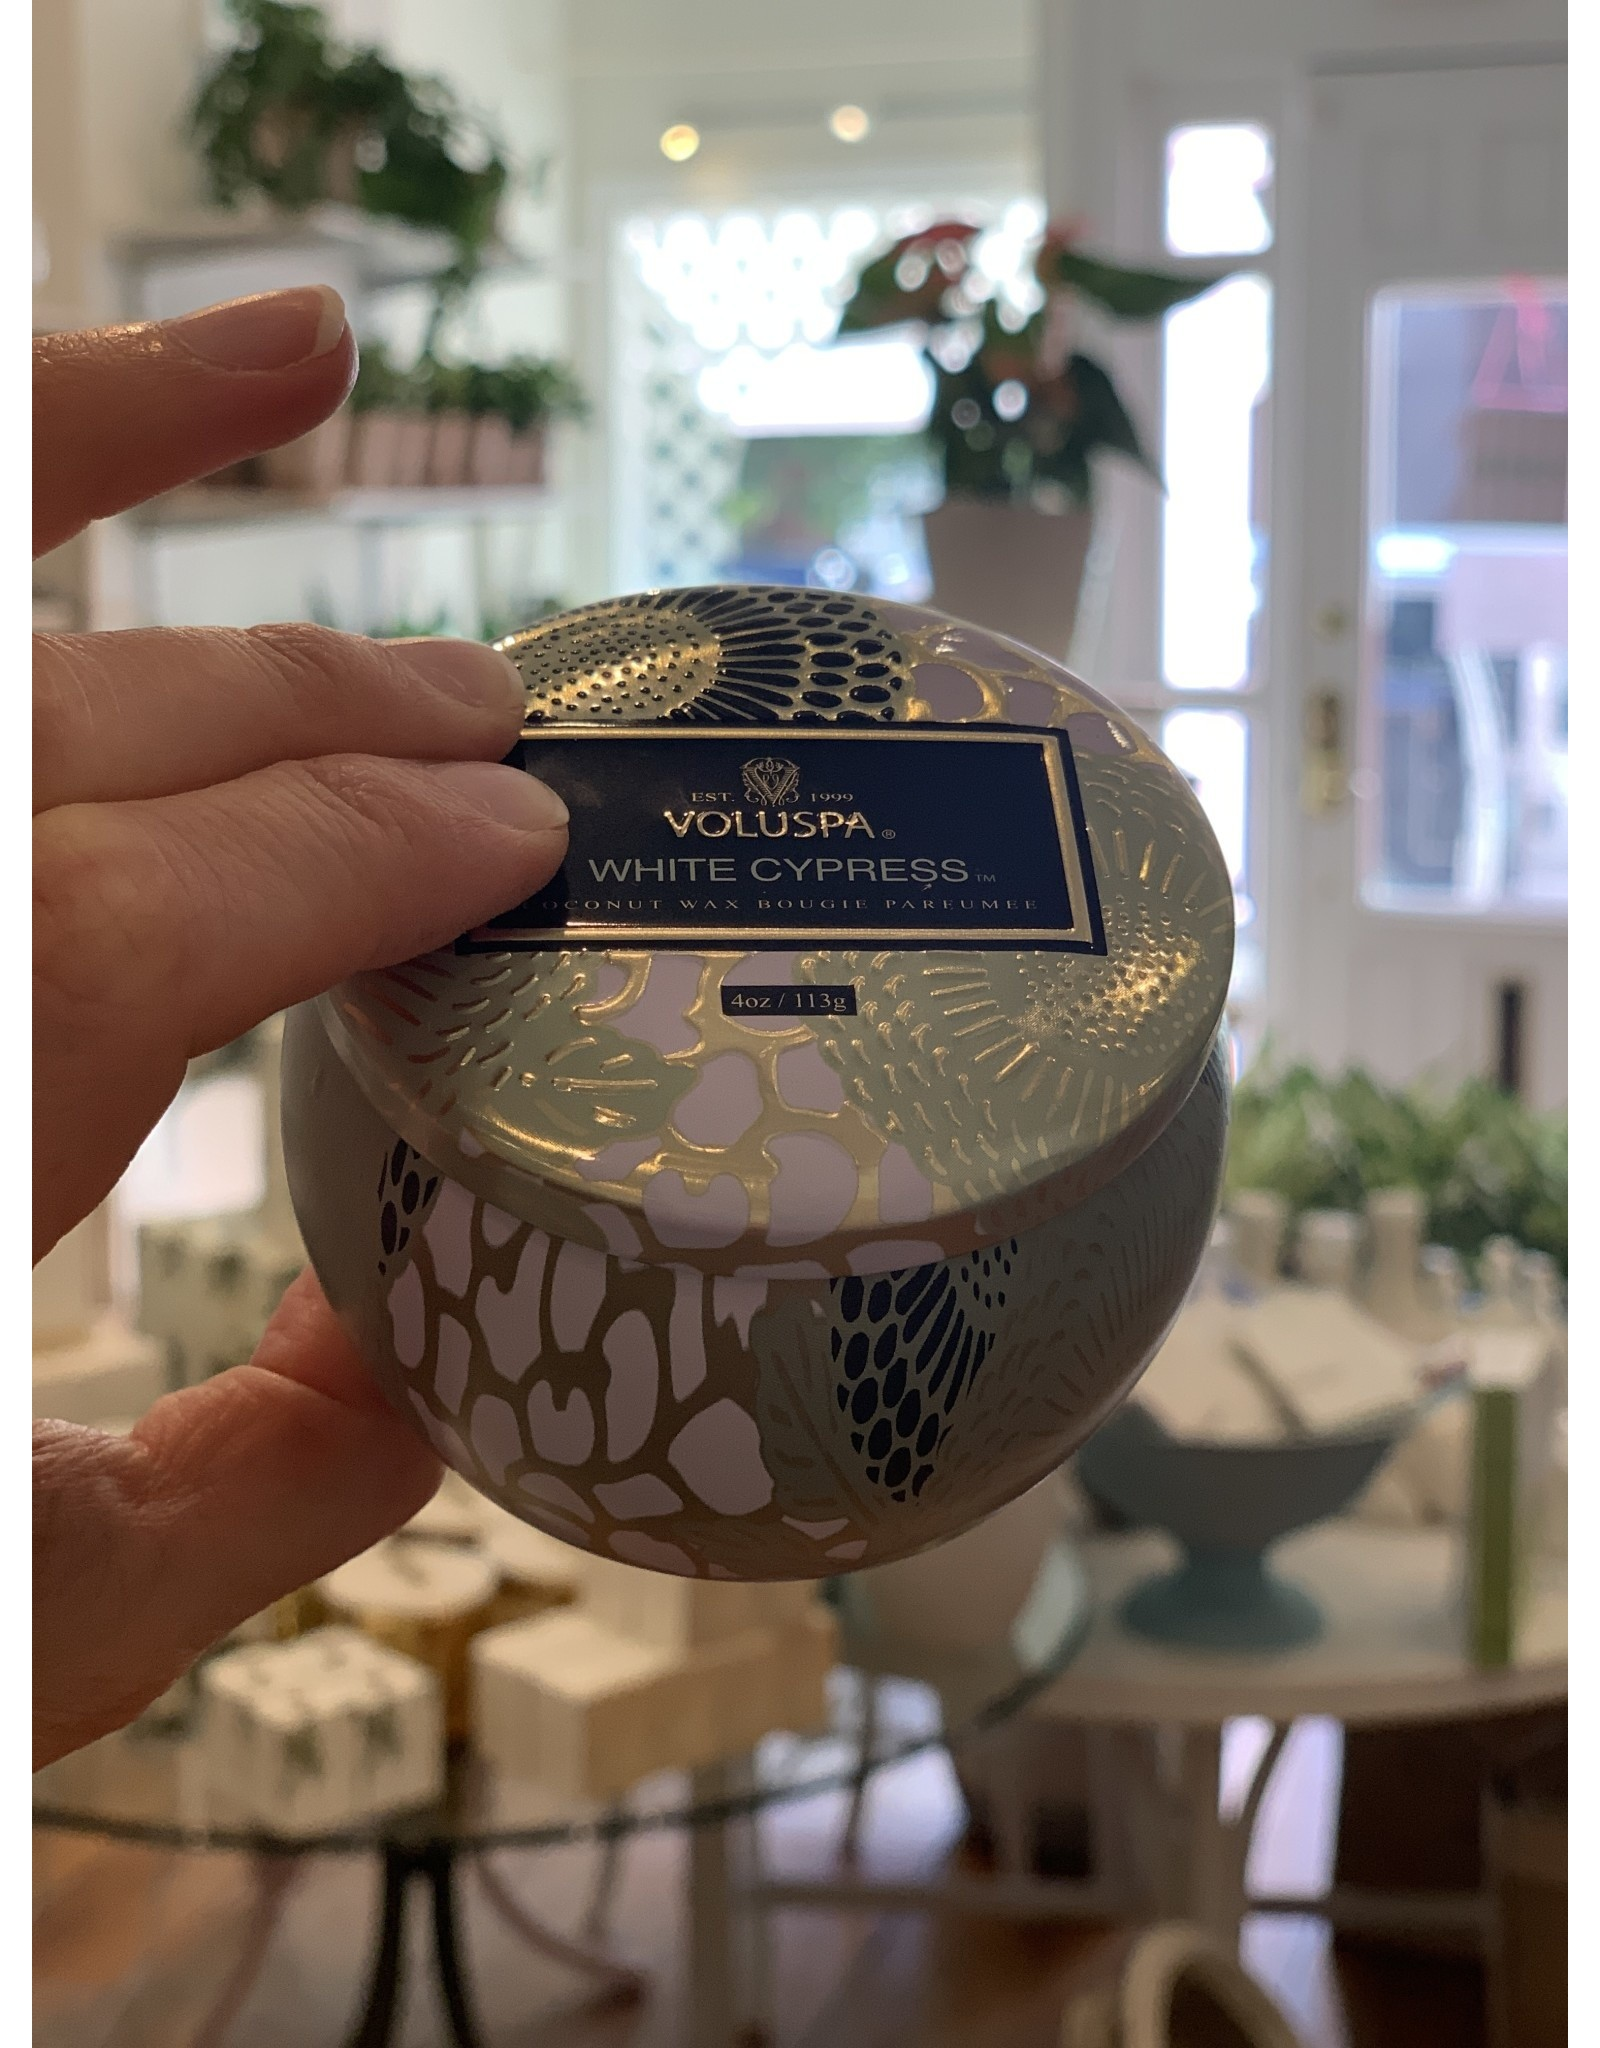 Voluspa White Cypress Petite Decorative Tin